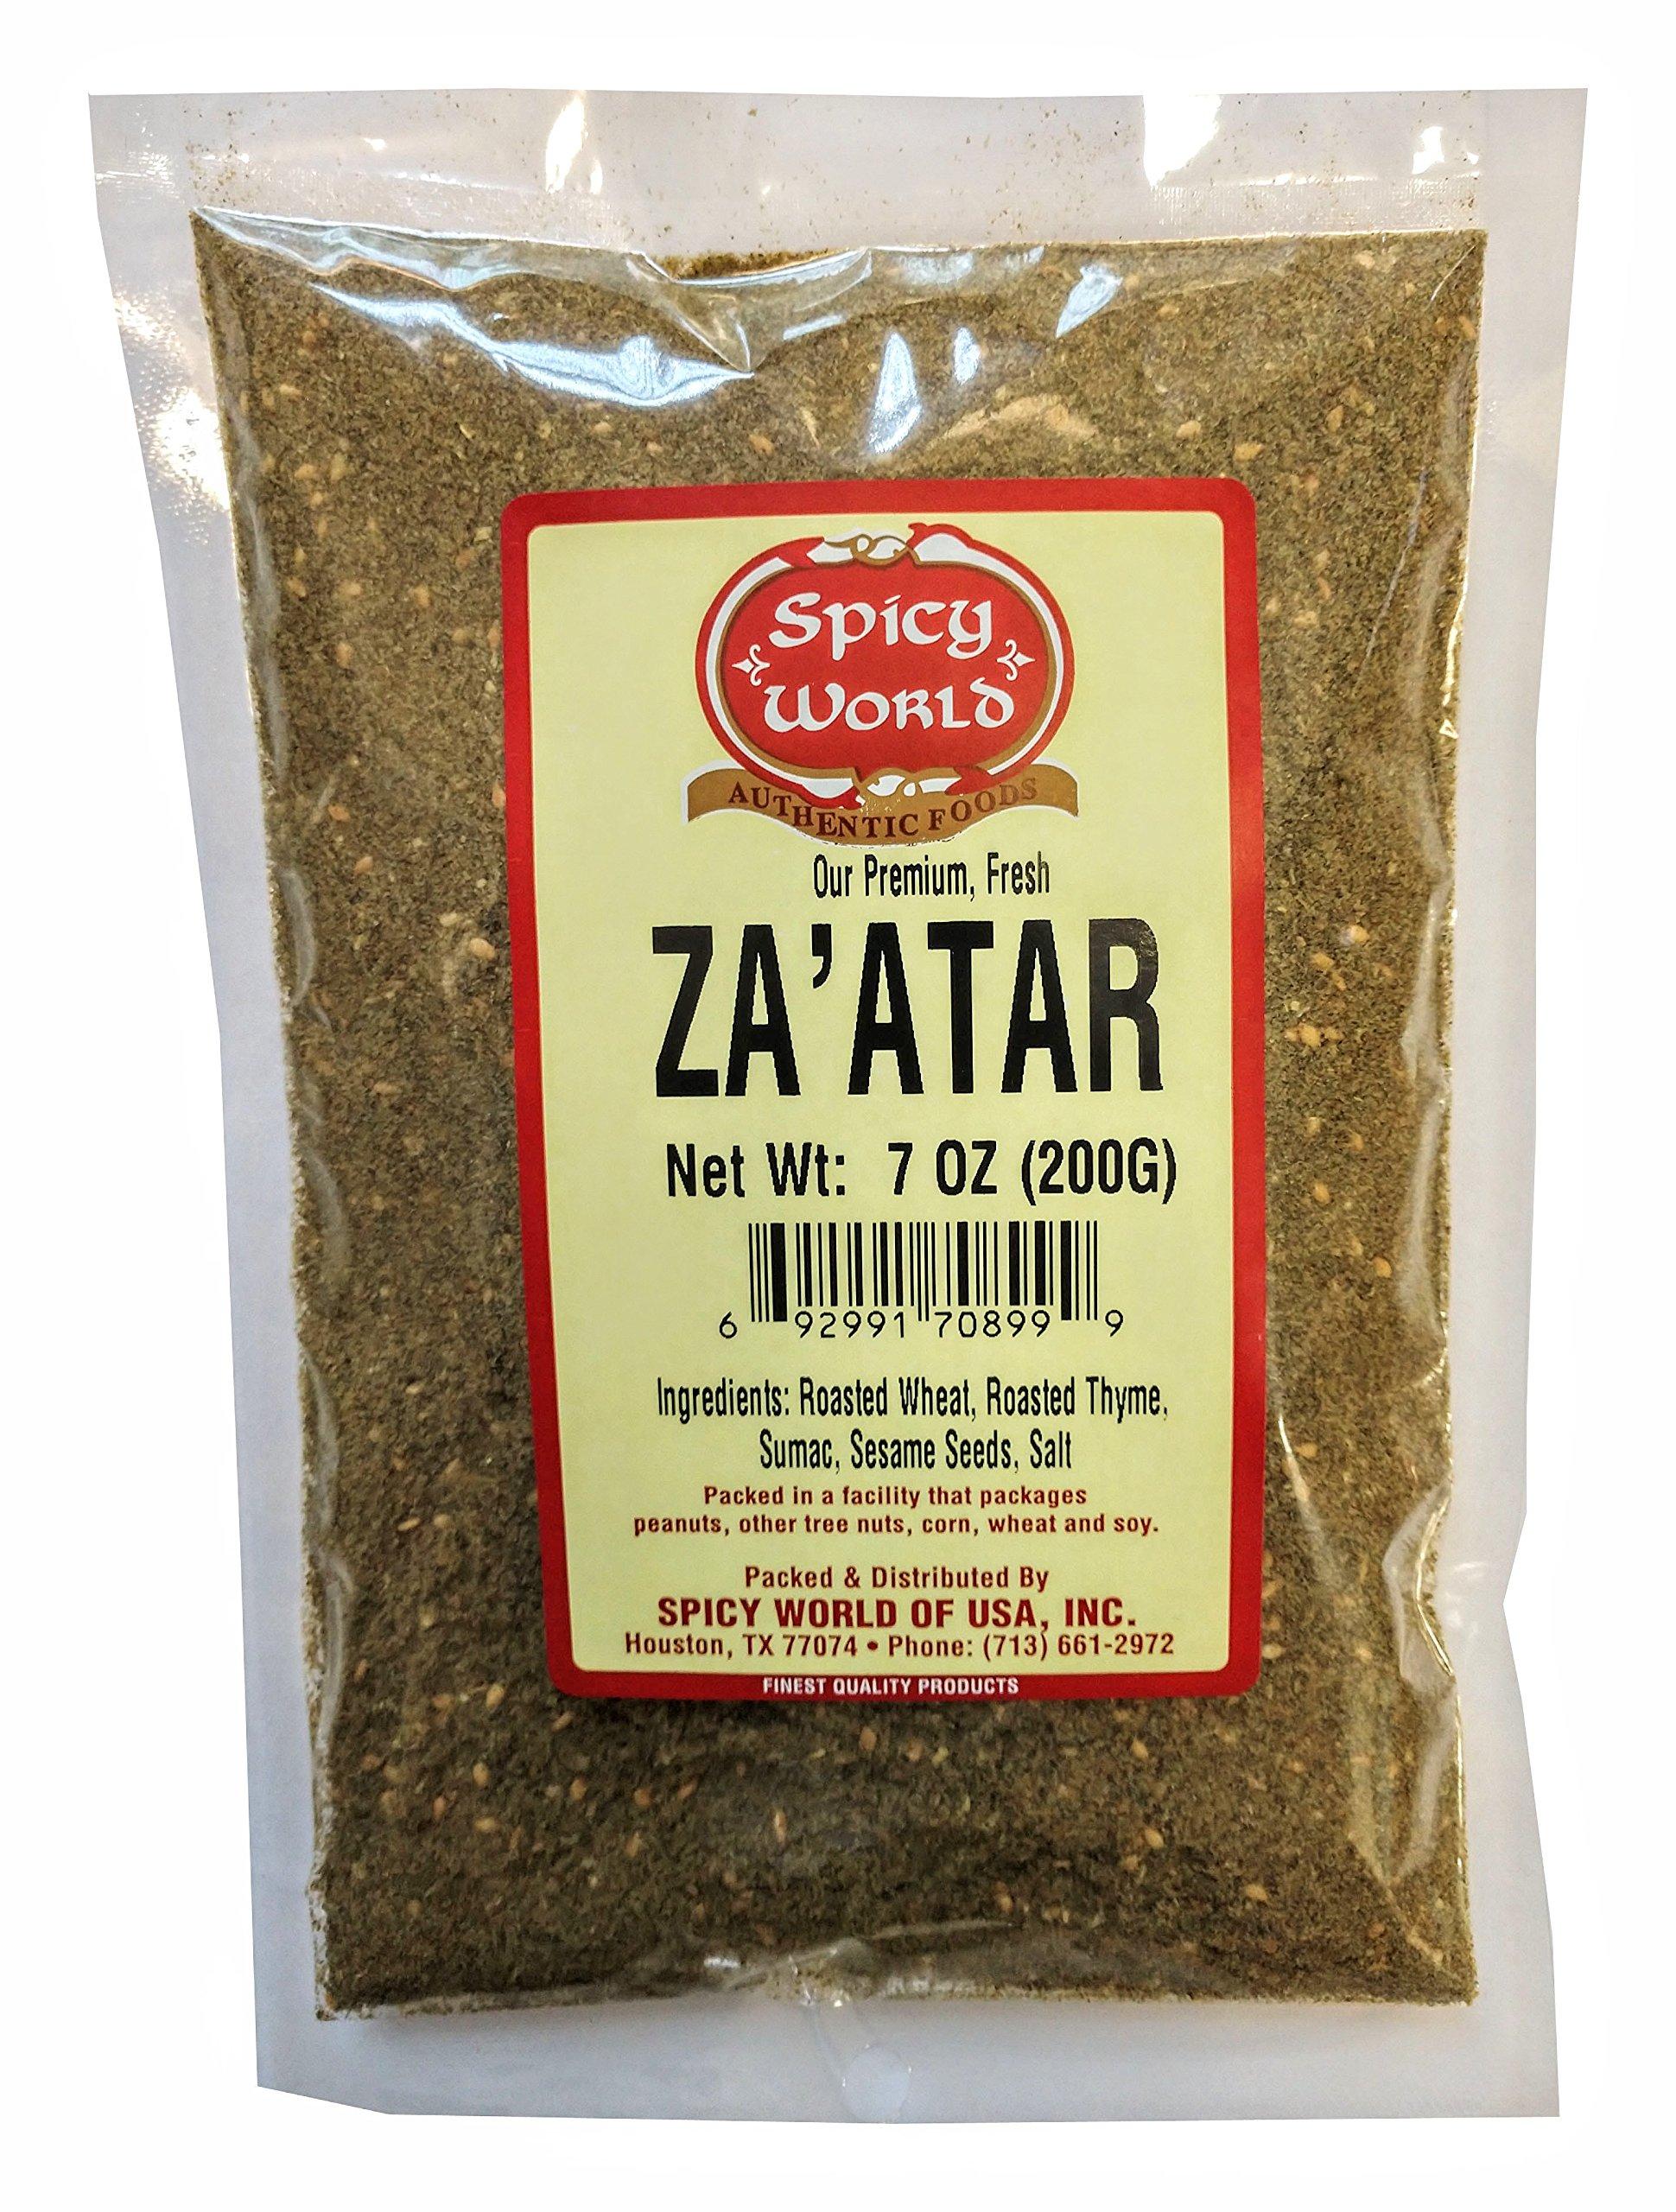 Spicy World Za'atar 7 Ounce - Freshly Packaged with Thyme and Sumac (Zatar/Zaatar/Zahtar)